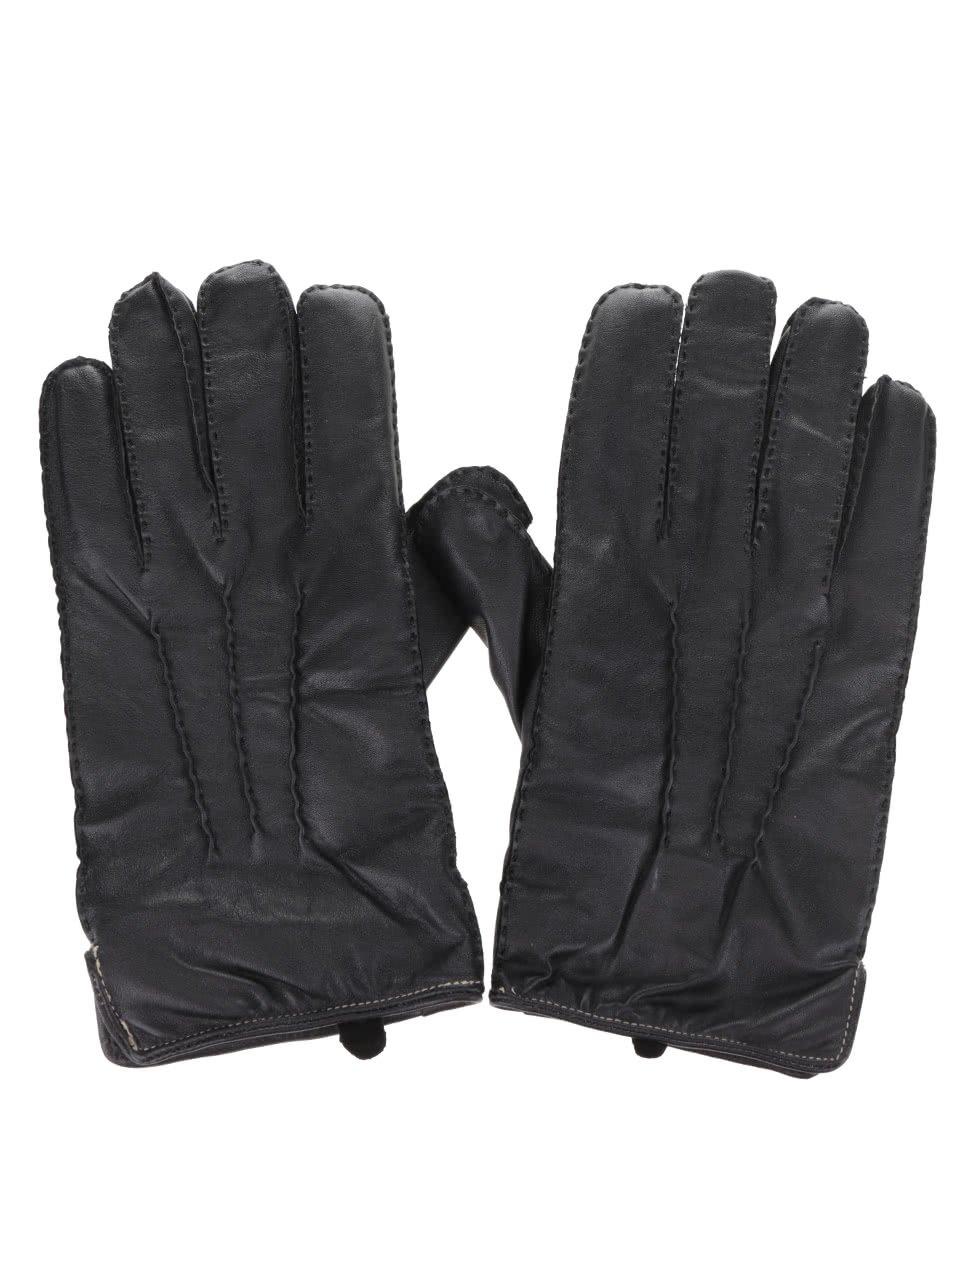 Černé kožené rukavice Dice